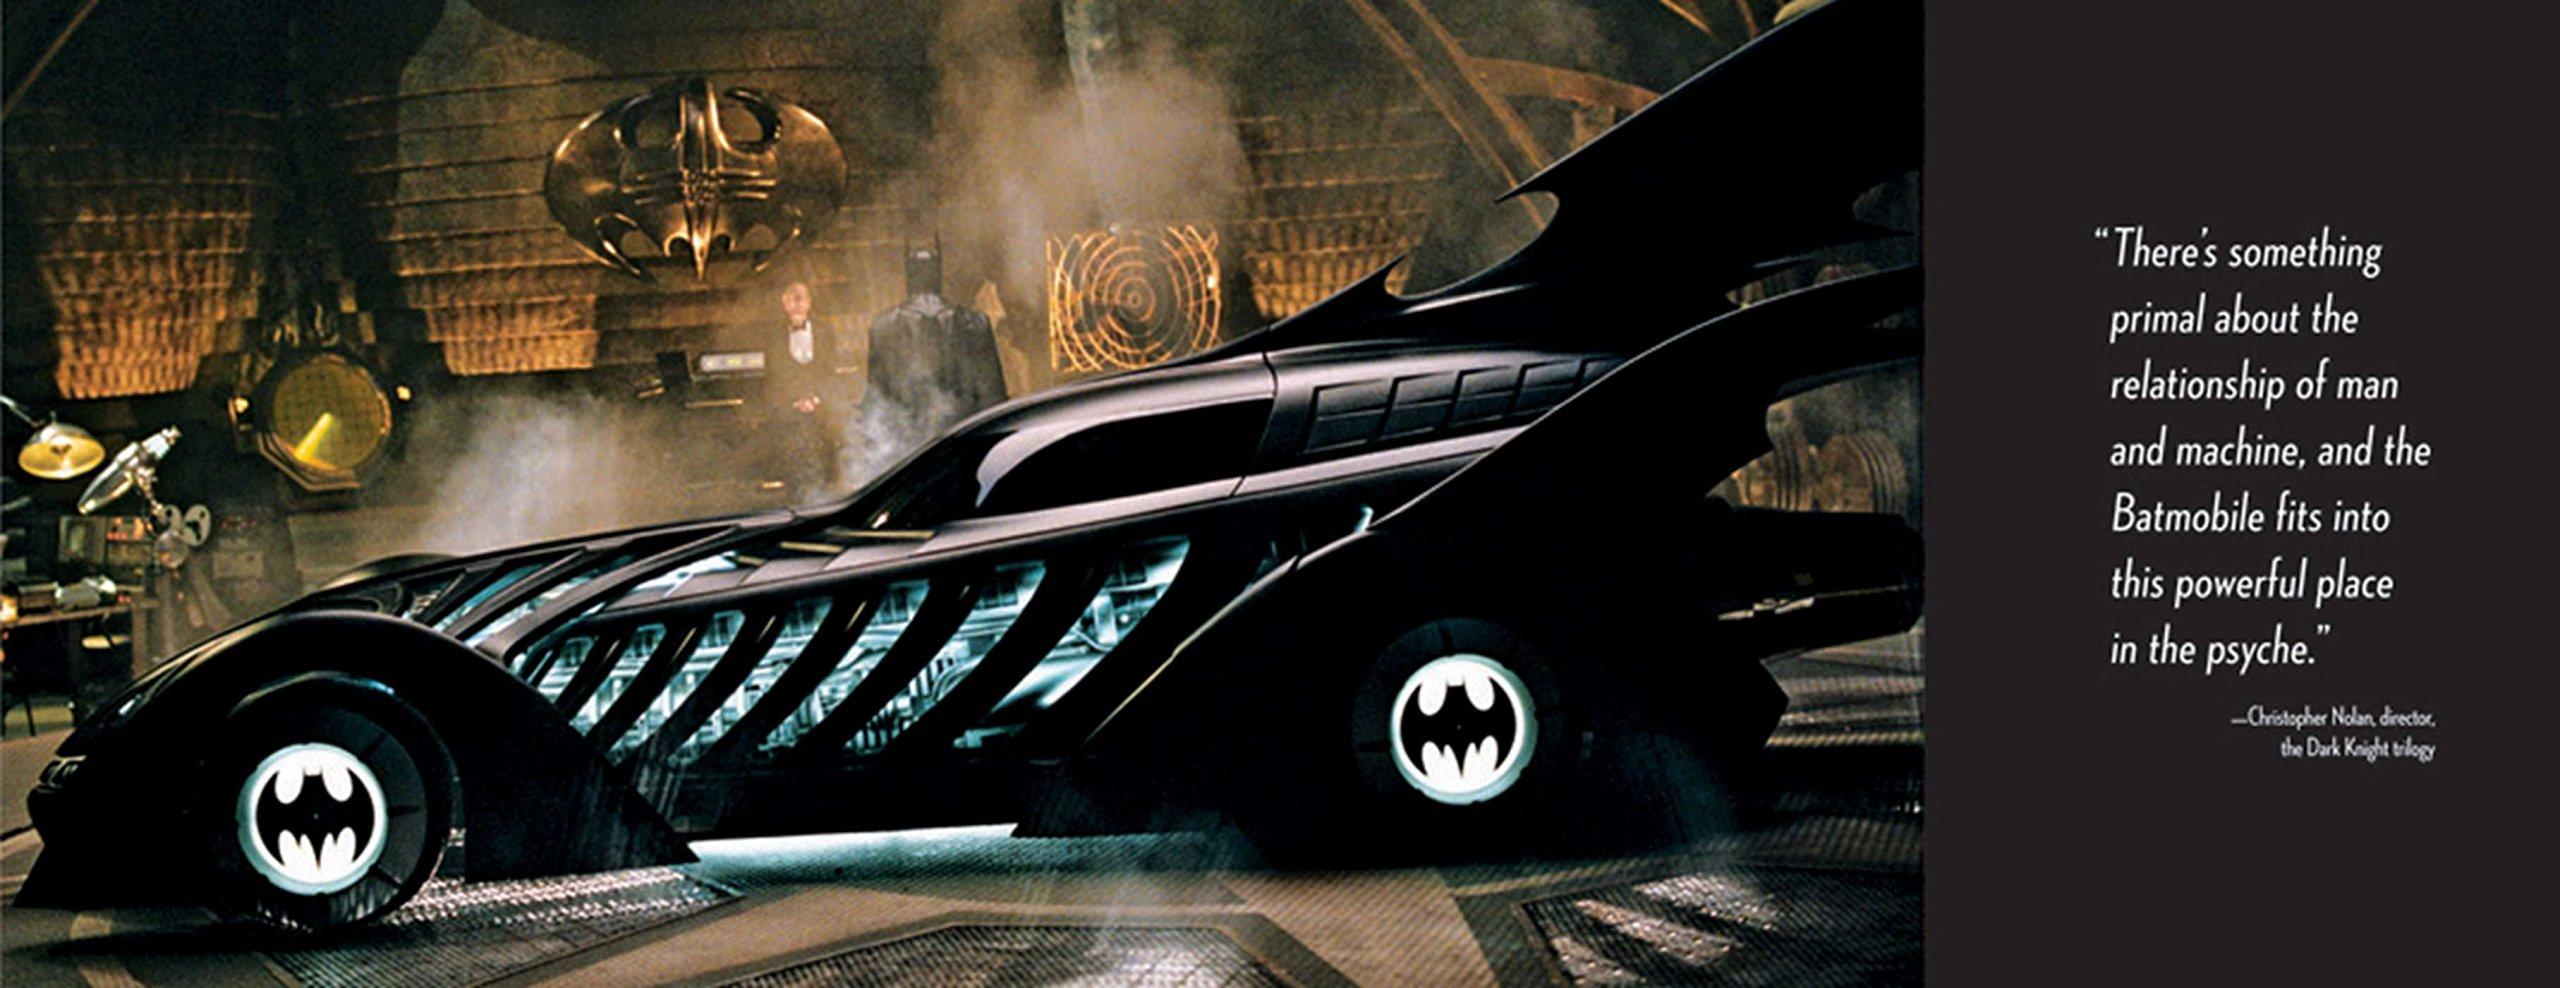 Batmobile: The Complete History: Mark Cotta Vaz: 9781608871032: Amazon.com:  Books